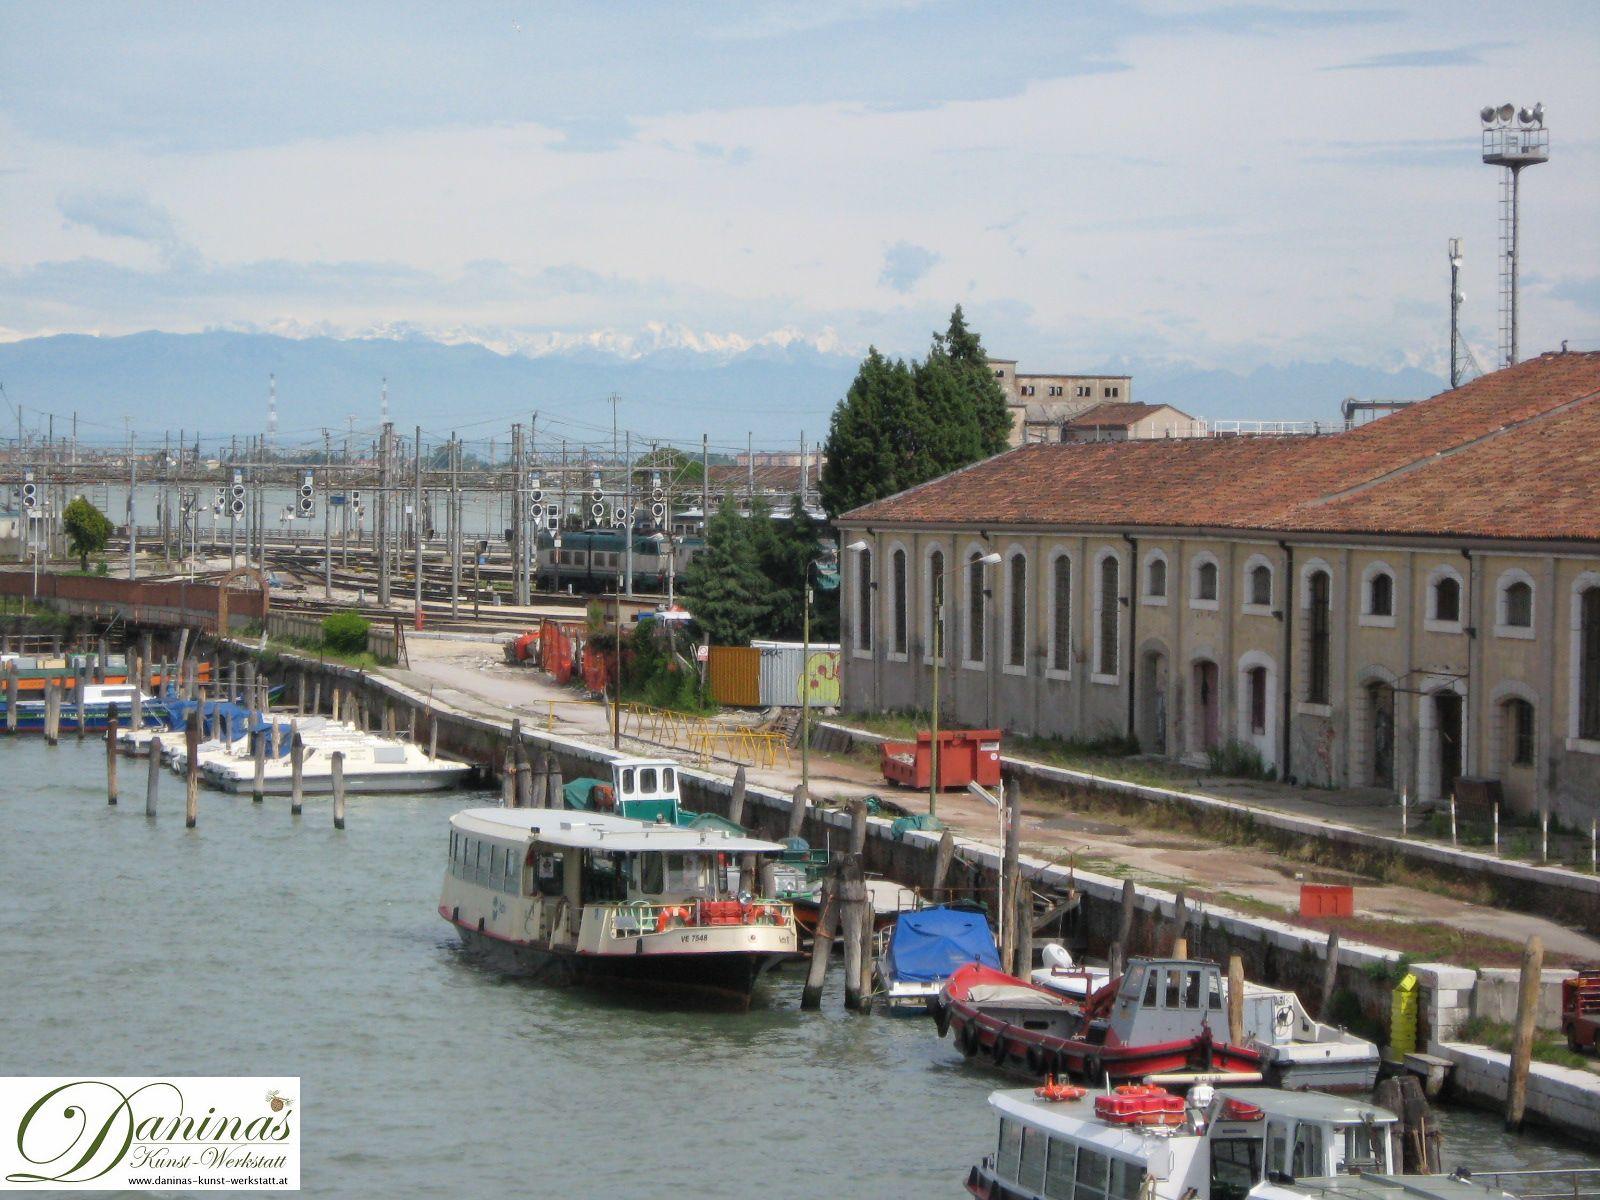 Venedig: Eisenbahnbrücke über die Lagune